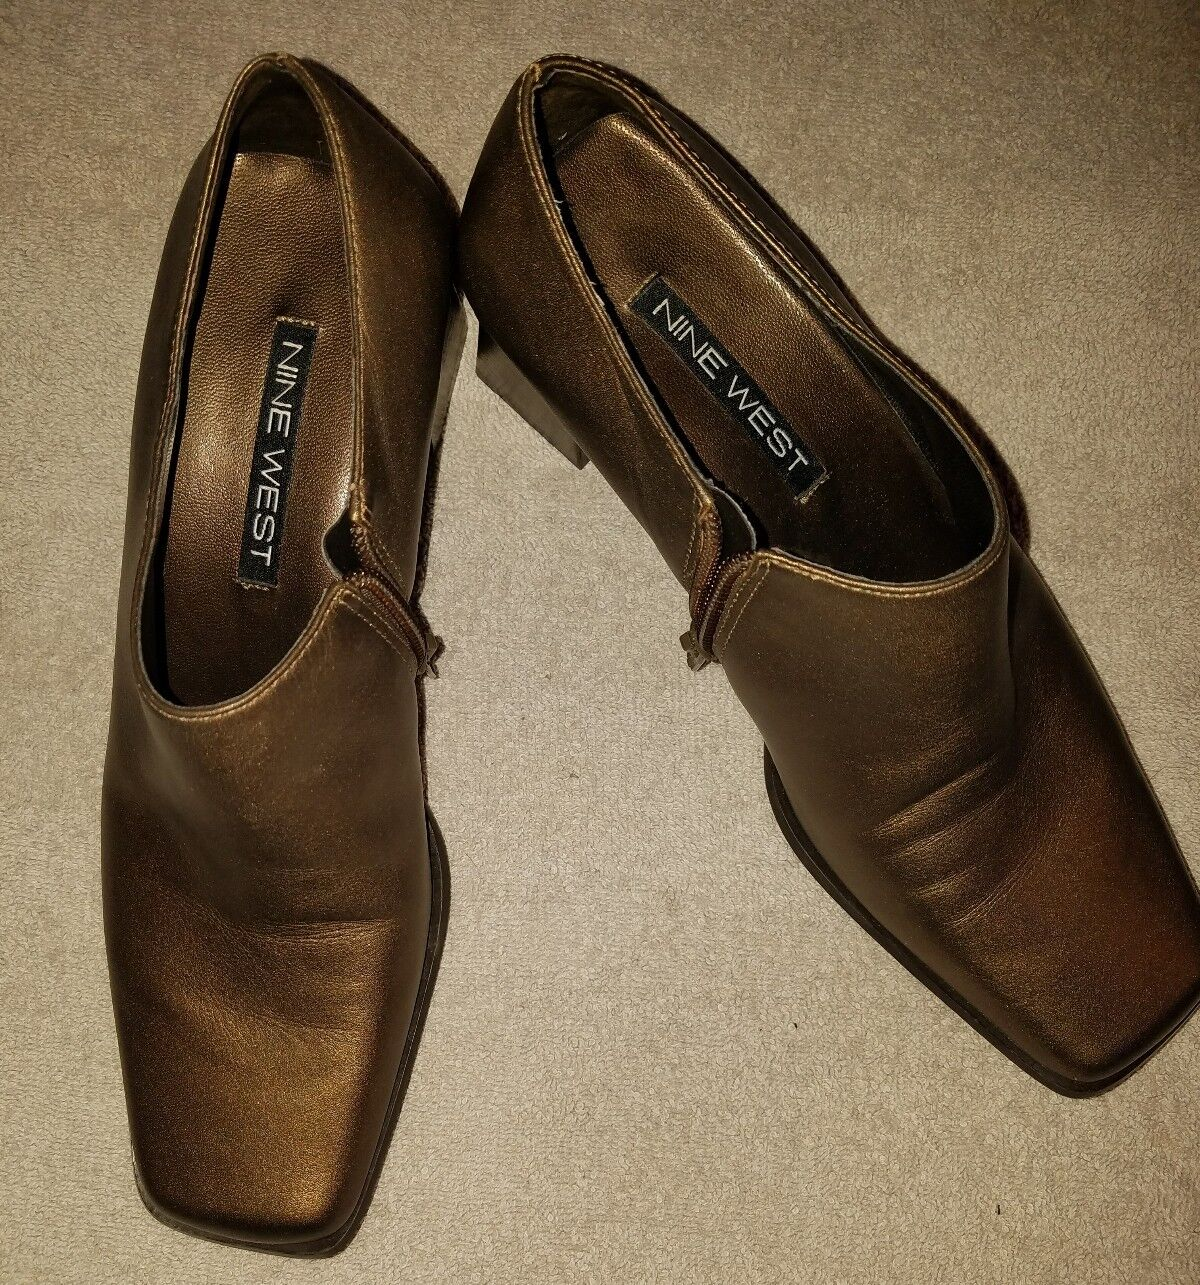 Nine West Womens Ankle Boot Size 6M Brown Leather Bootie Zipper Block Heel Pump